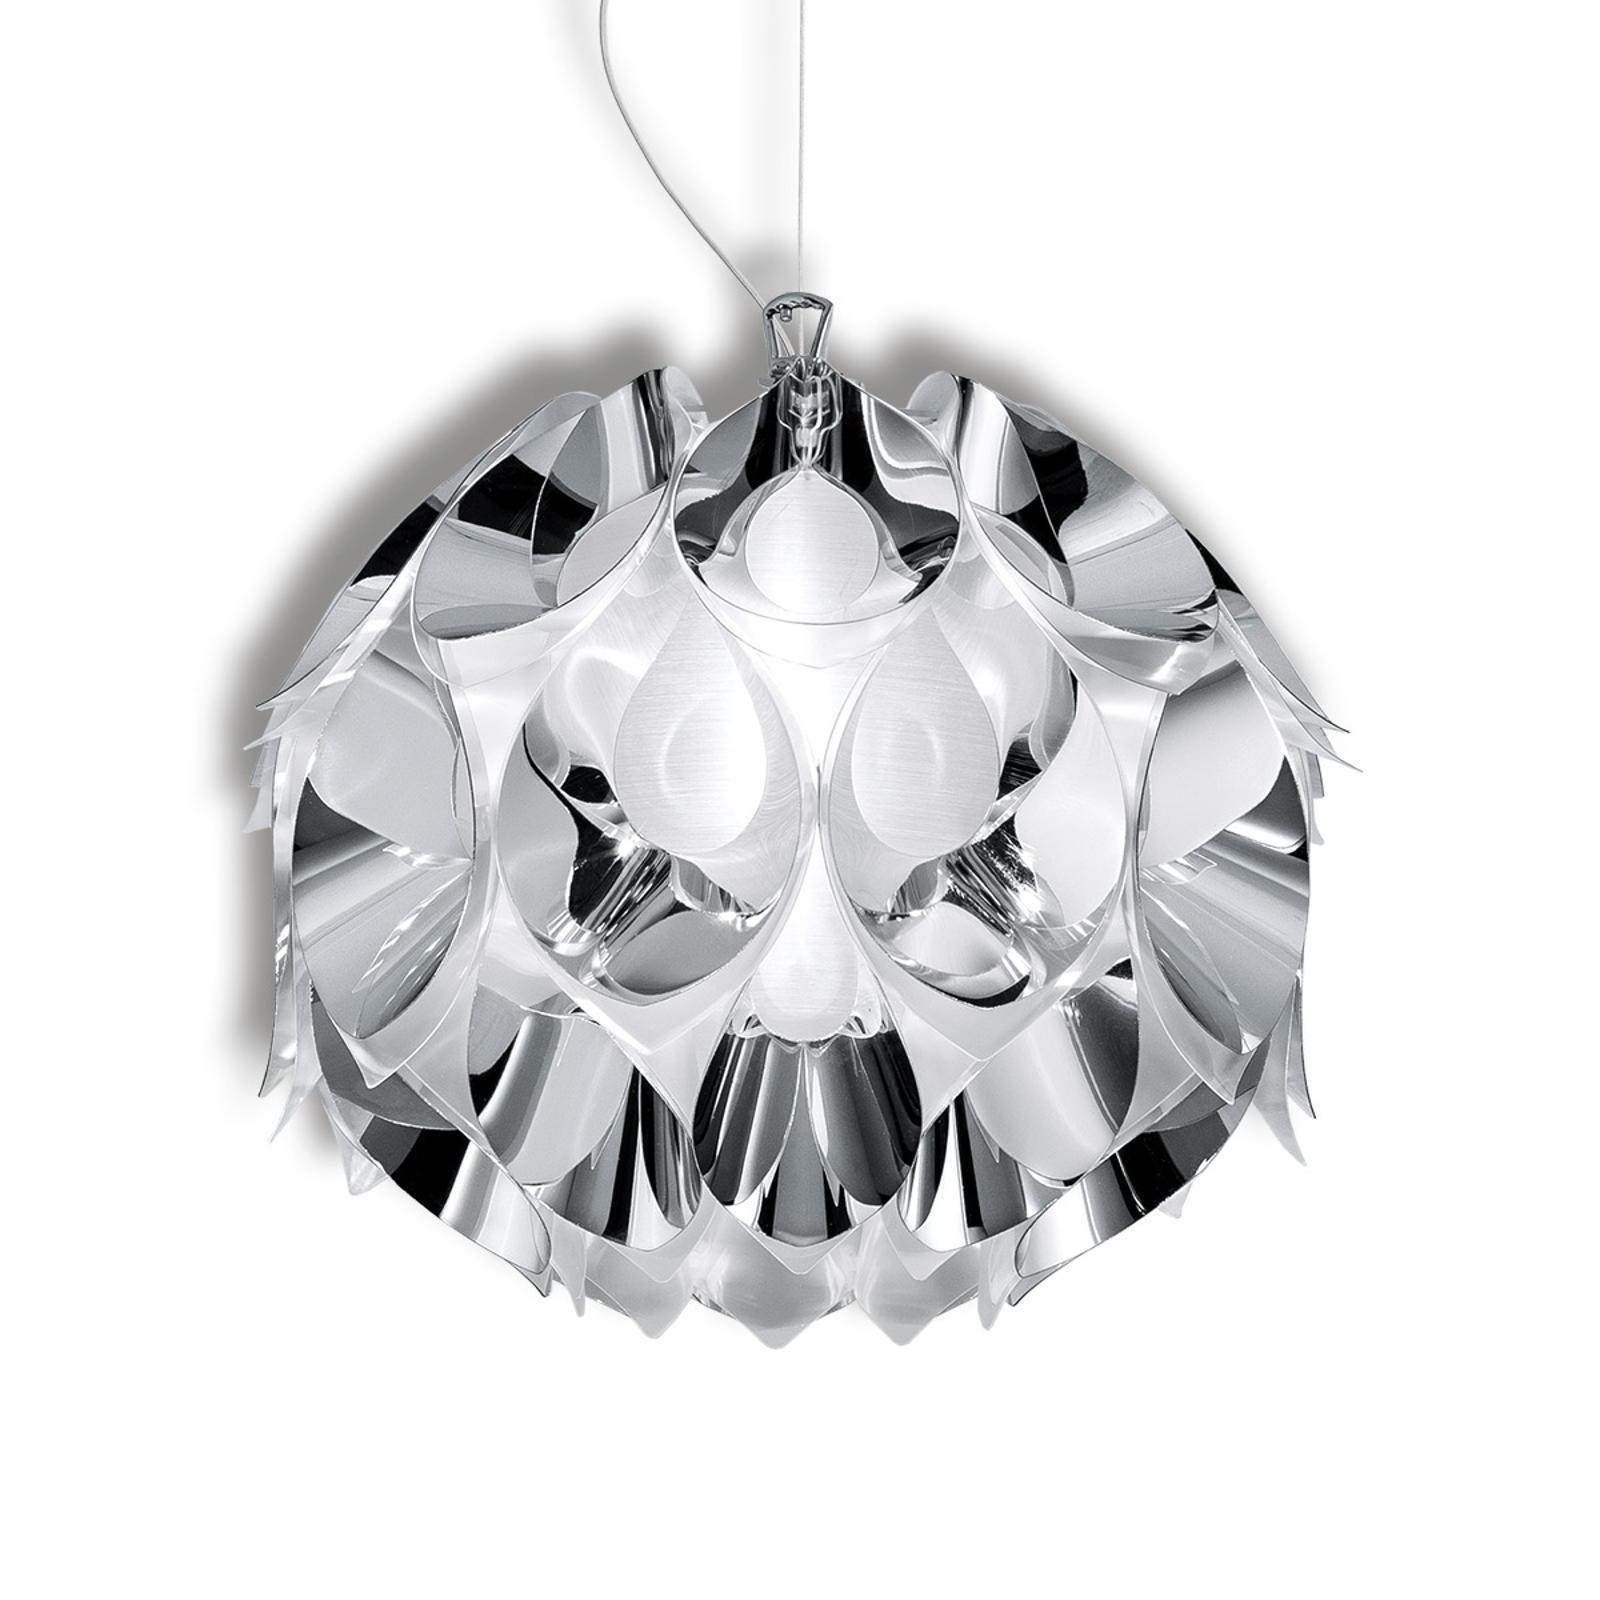 Lumoava Flora-riippuvalaisin, hopea, 36 cm